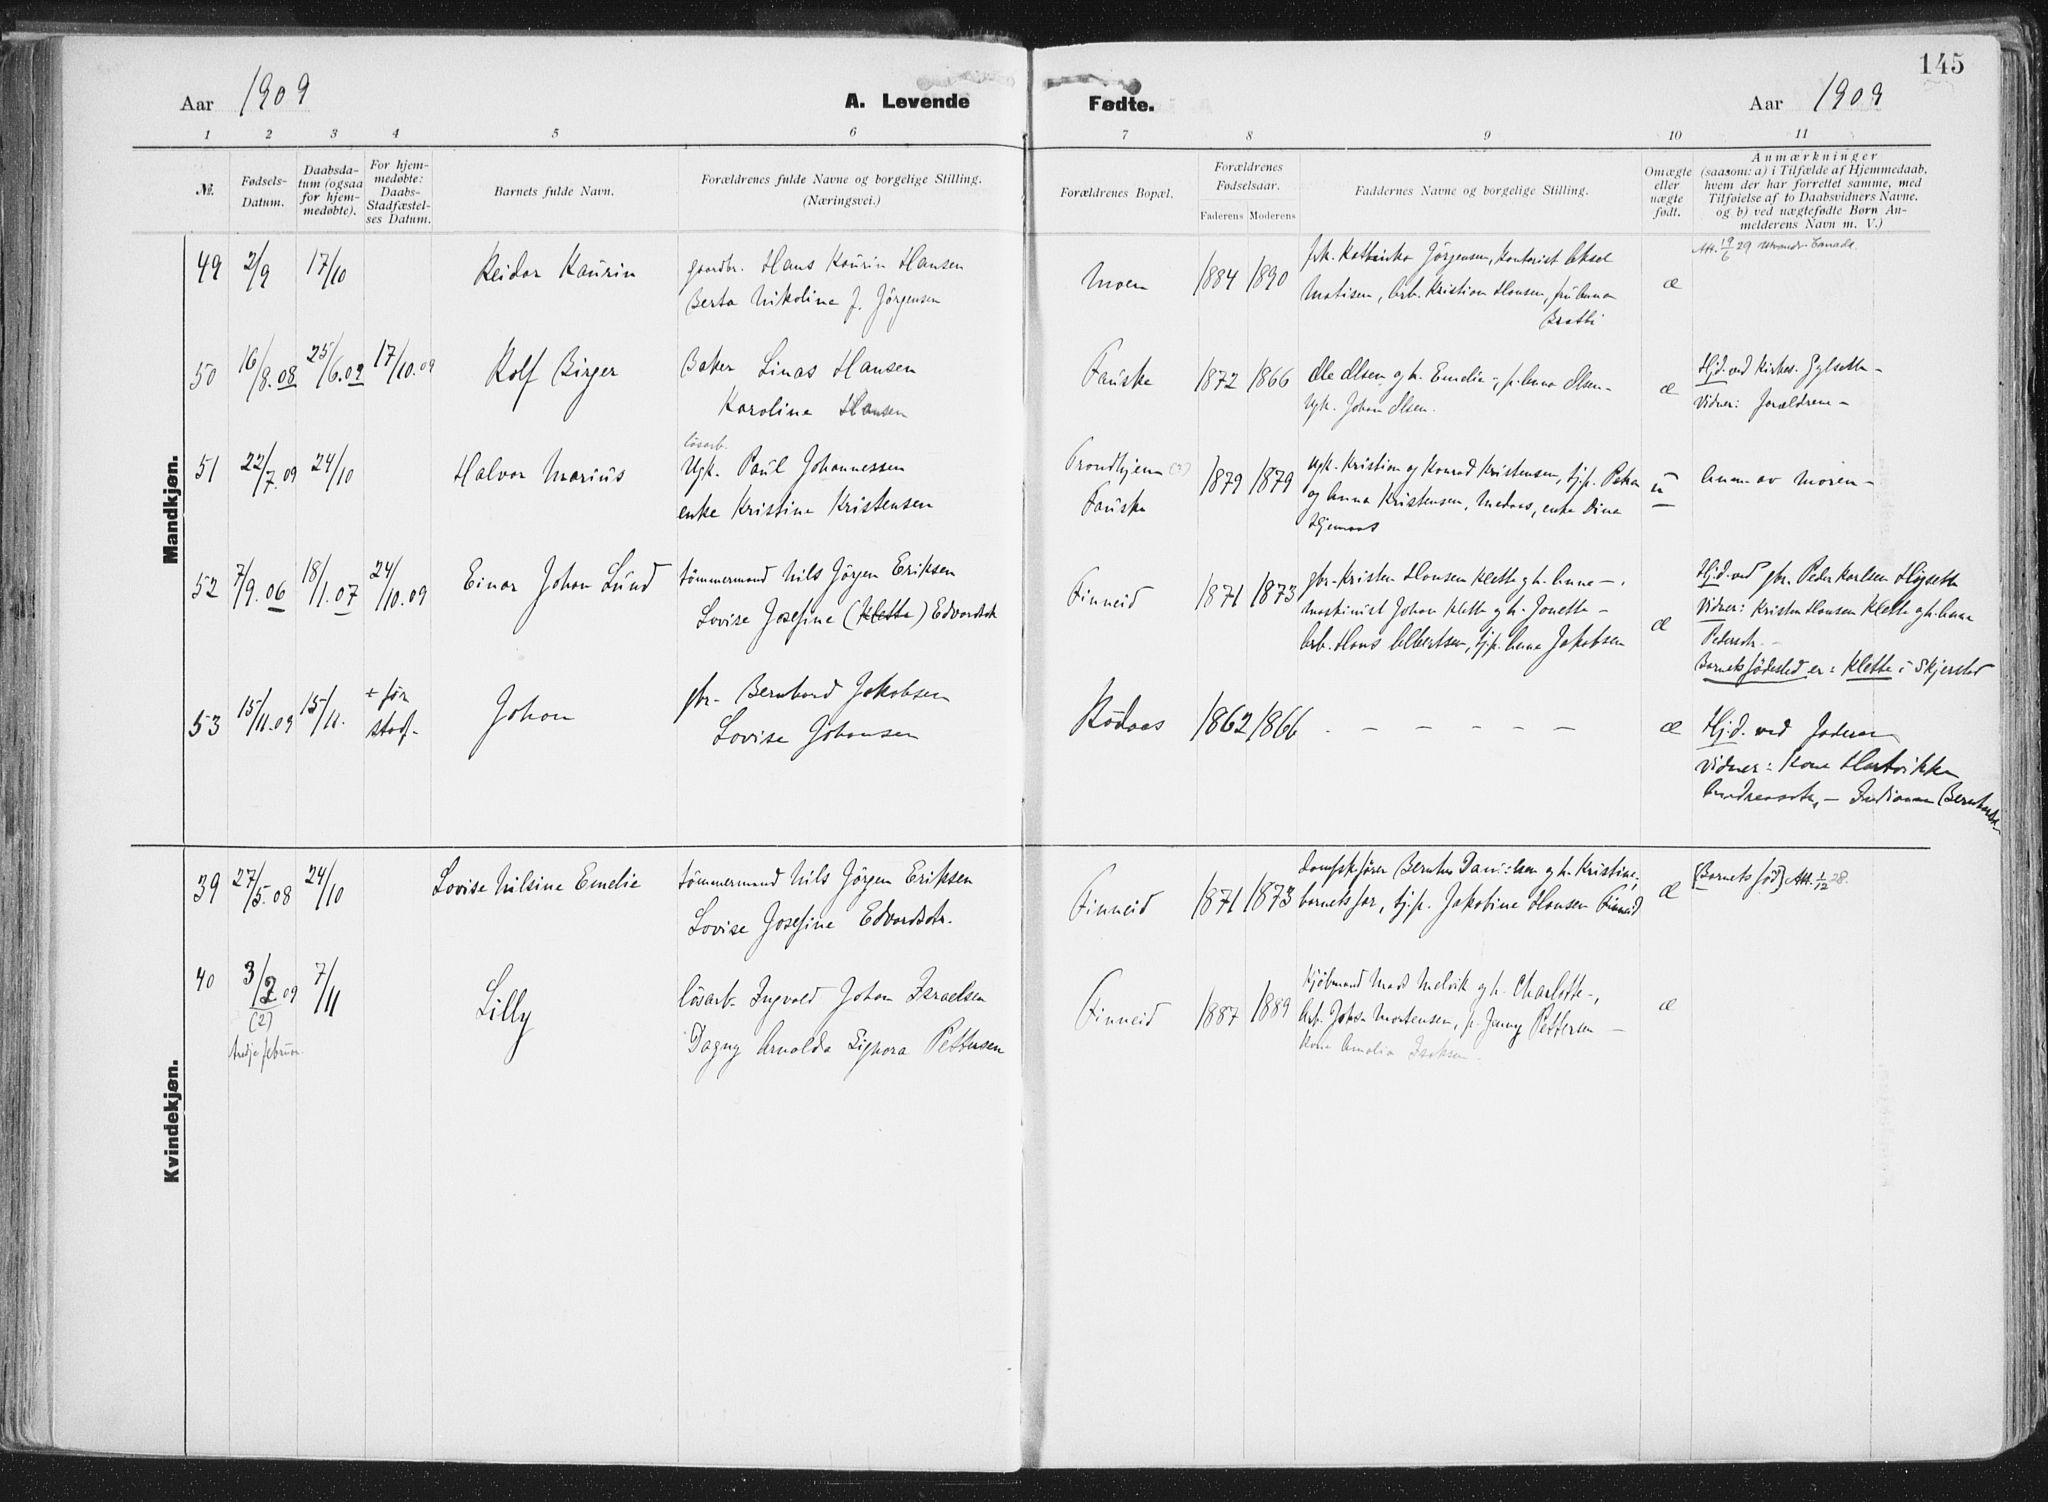 SAT, Ministerialprotokoller, klokkerbøker og fødselsregistre - Nordland, 849/L0696: Ministerialbok nr. 849A08, 1898-1910, s. 145